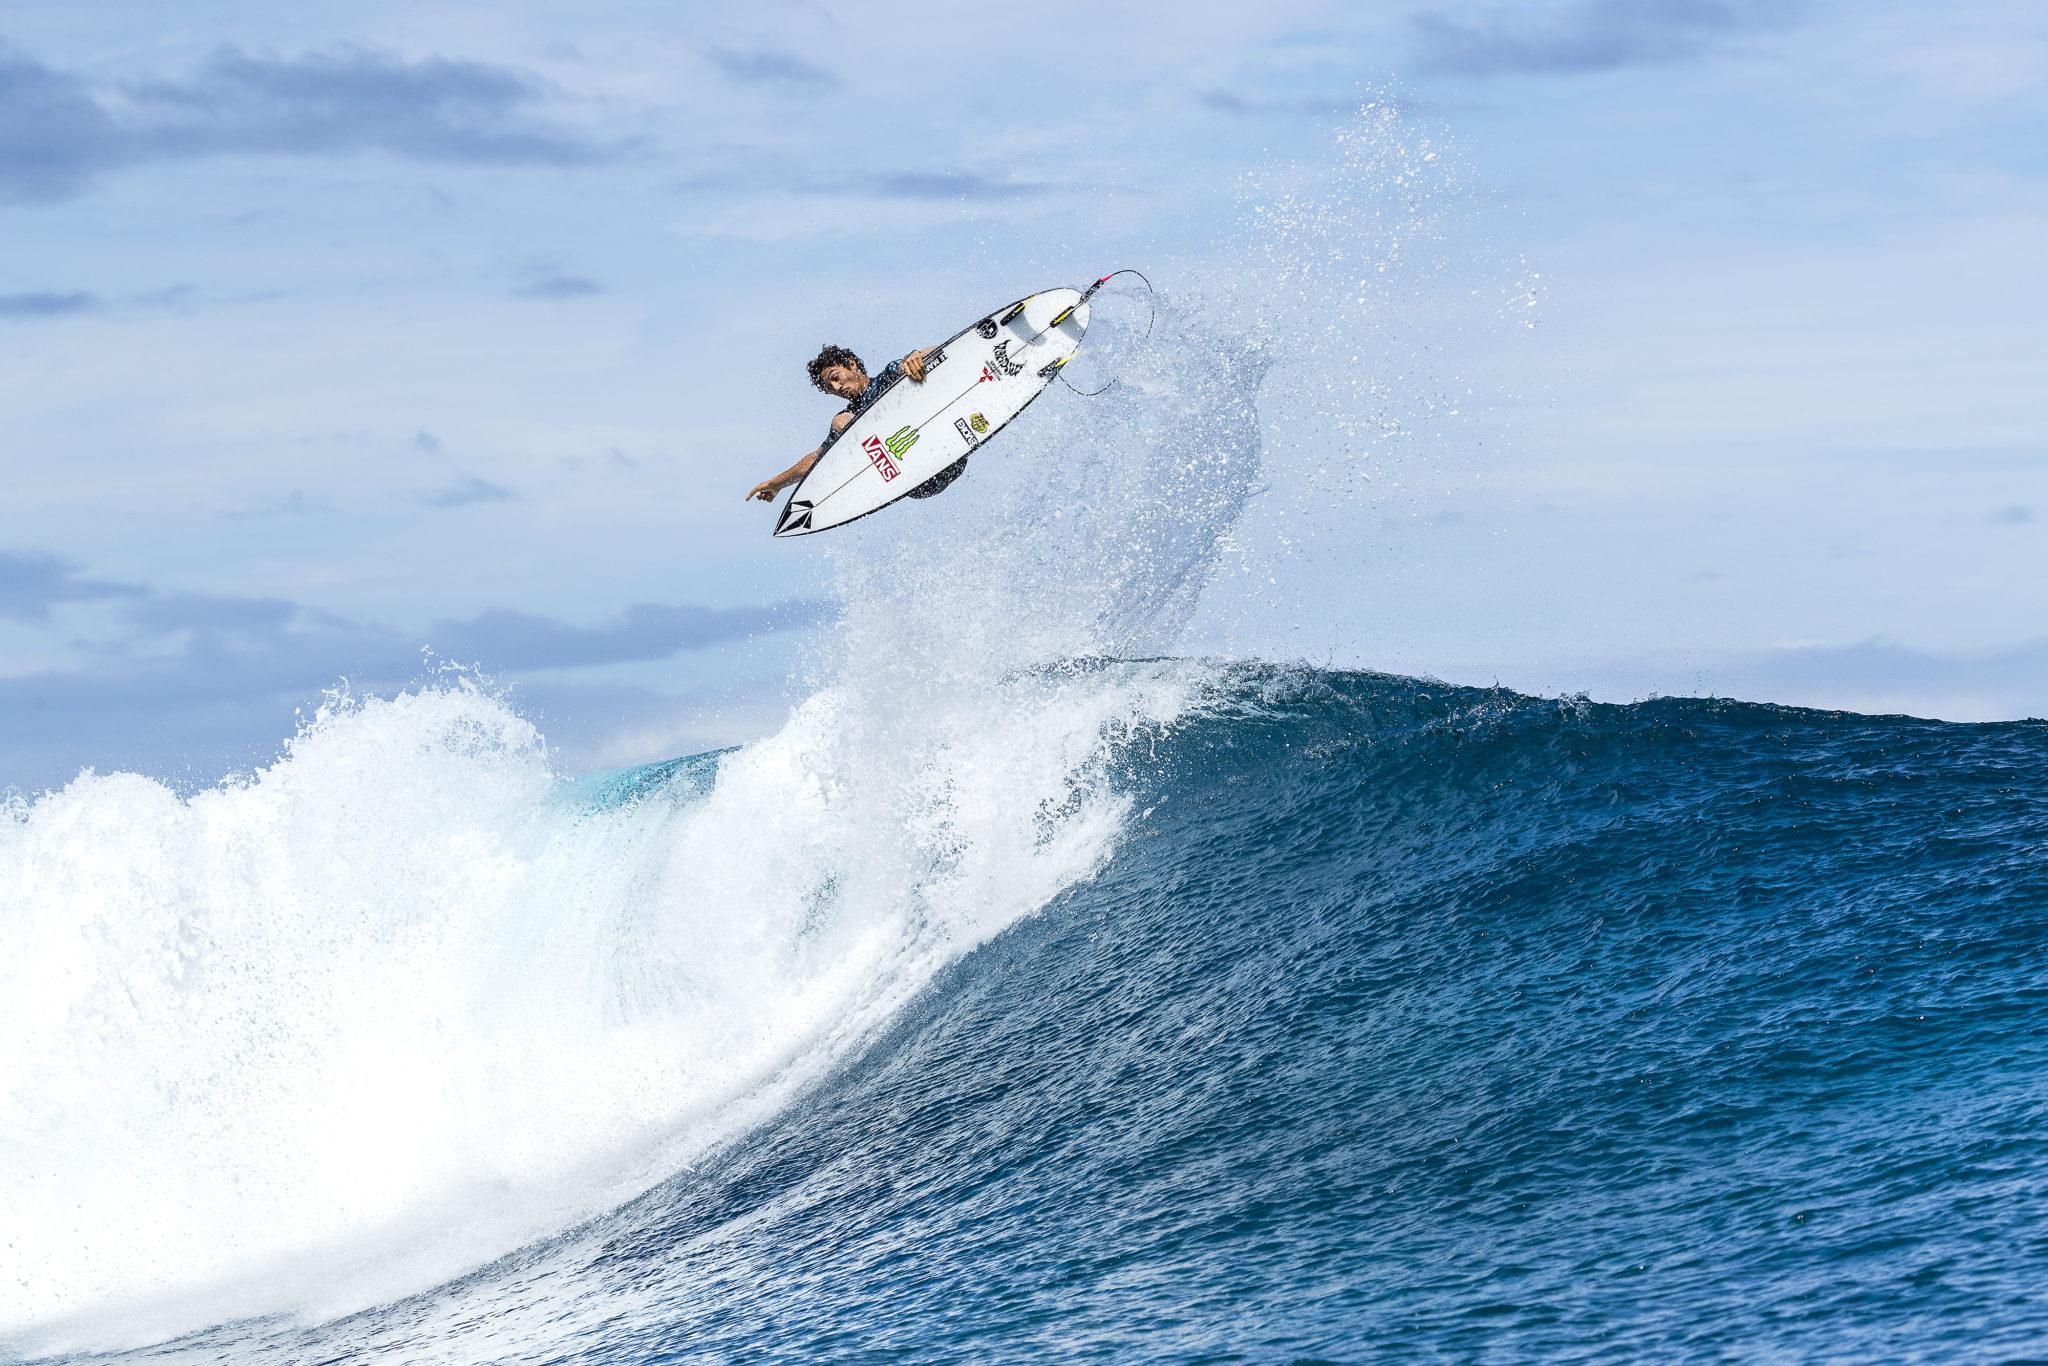 Yago Dora (BRA) advances to Round 3 of the 2018 Tahiti Pro Teahupo'o after winning Heat 12 of Round 2 at Teahupo'o.